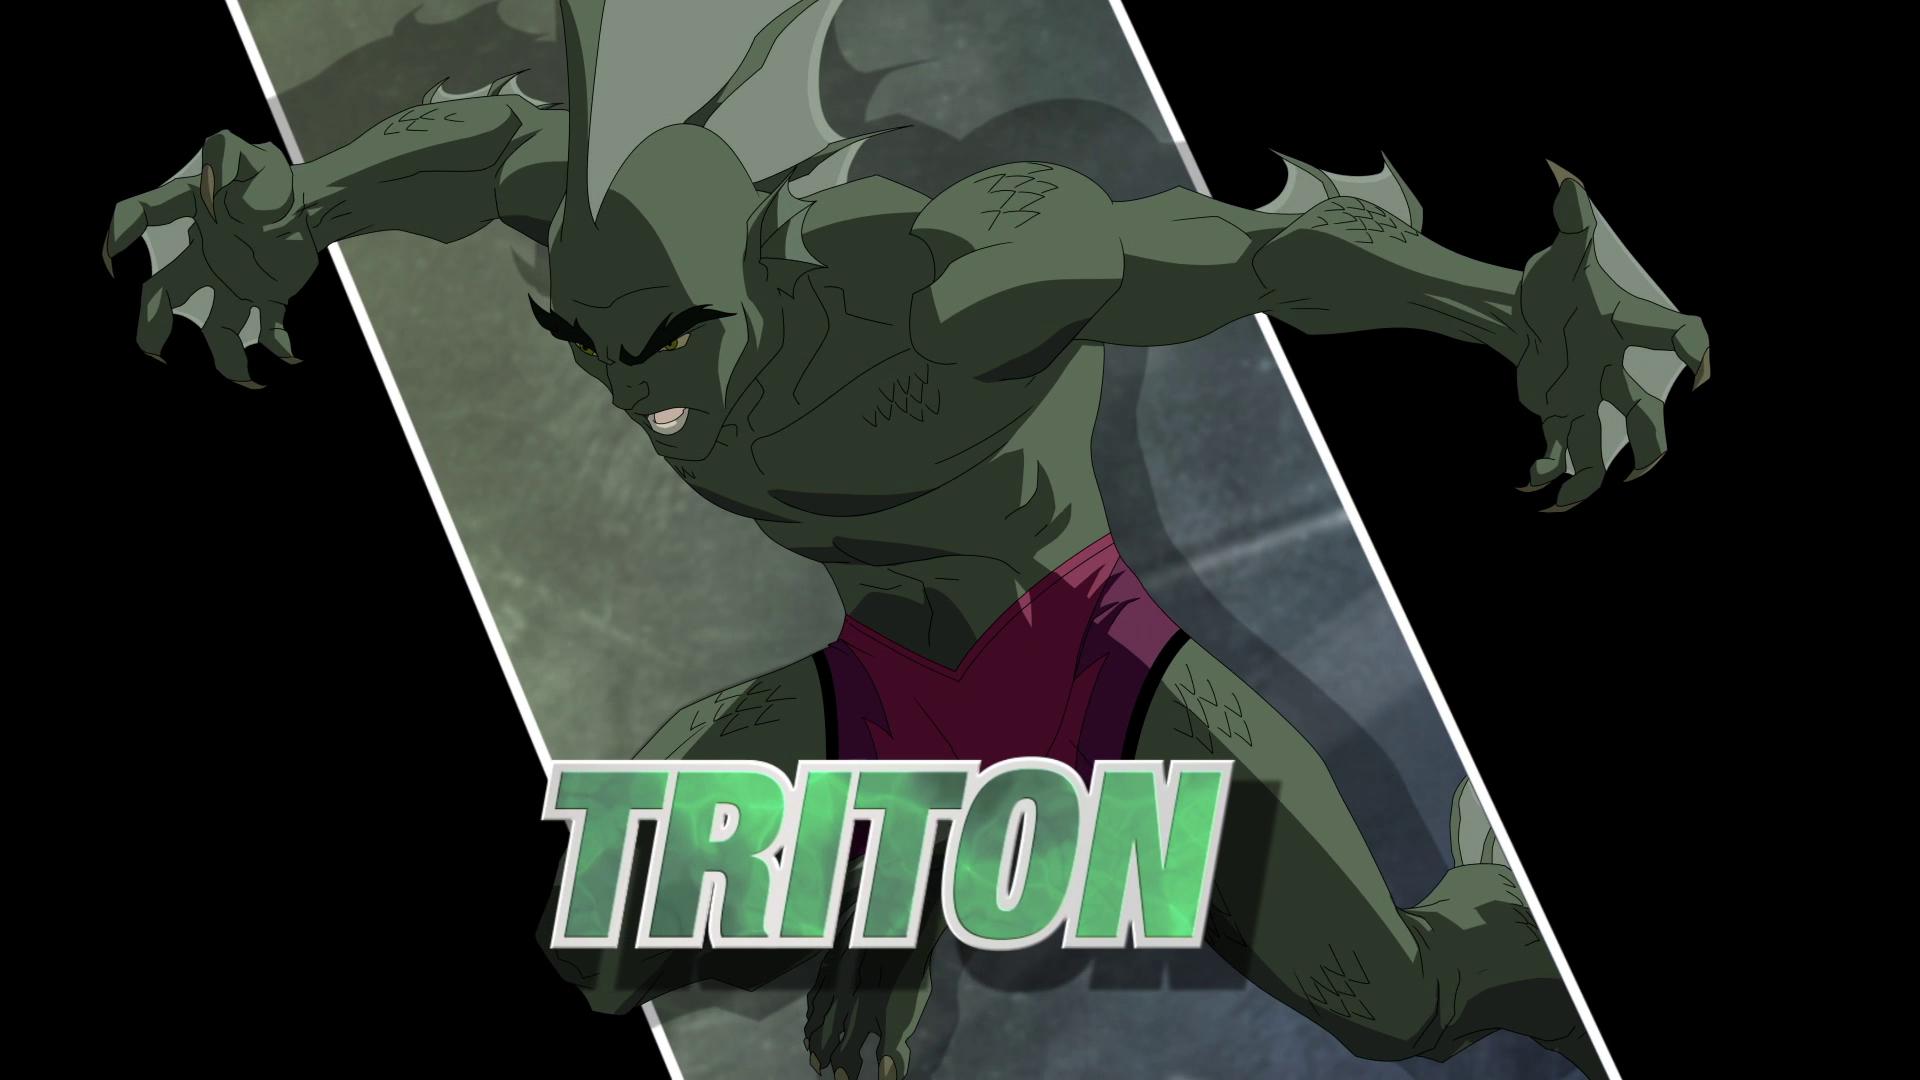 Triton (2010s Marvel Animated Universe)